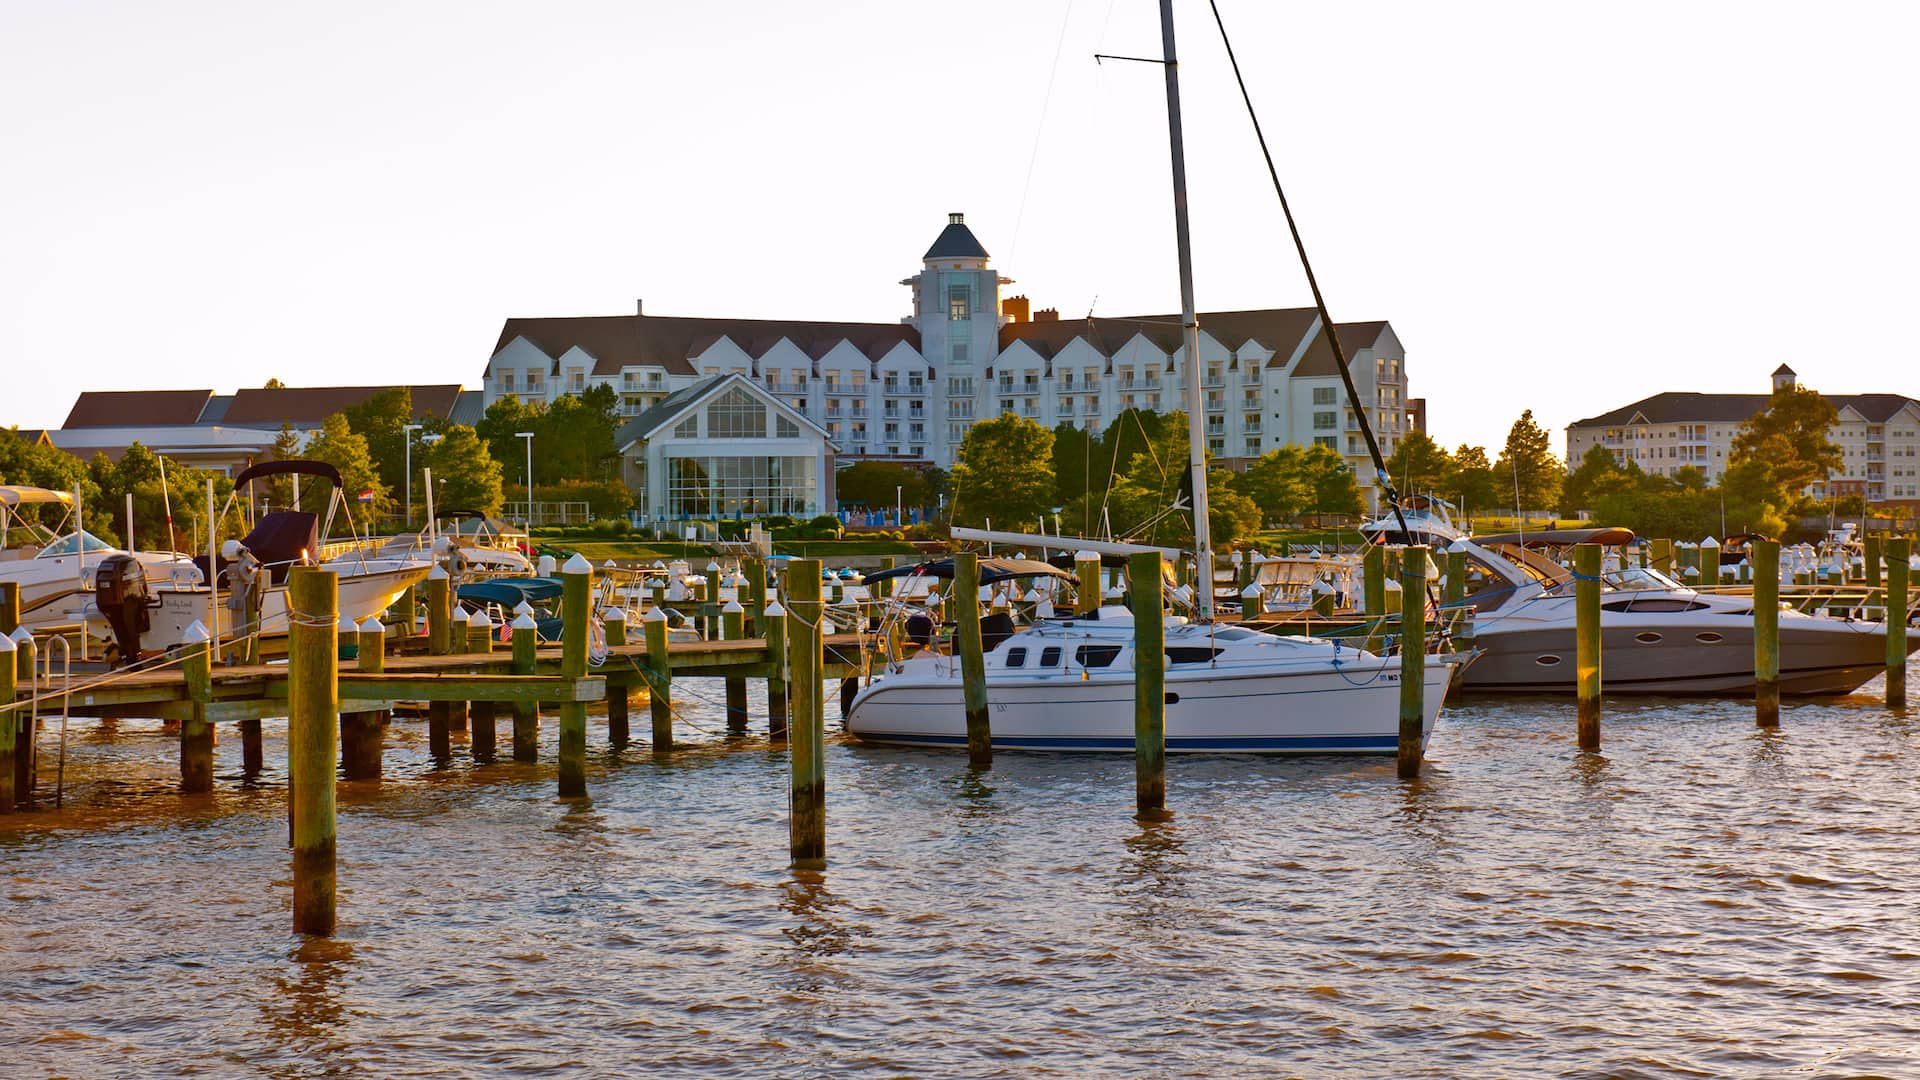 River Marsh Marina   Hyatt Regency Chesapeake Bay Golf Resort, Spa and Marina